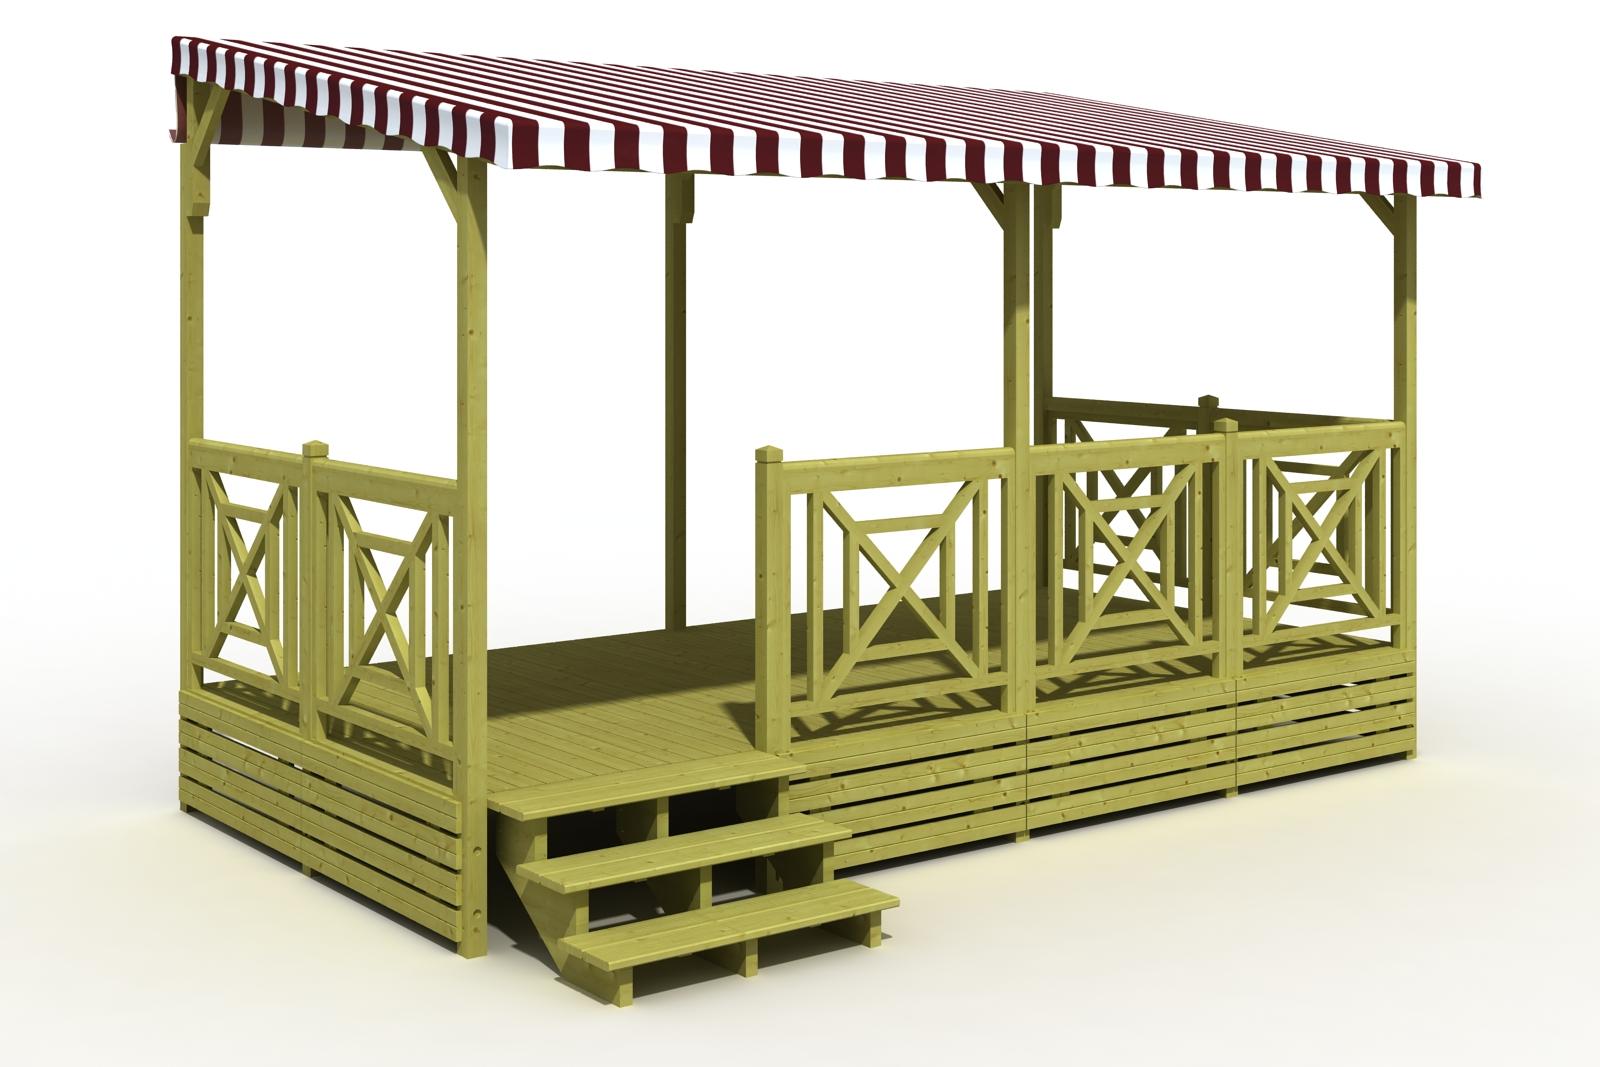 terrasse malte 250x480 ou 300x480 terrasse mobil home deckit fabricant terrasses en bois. Black Bedroom Furniture Sets. Home Design Ideas